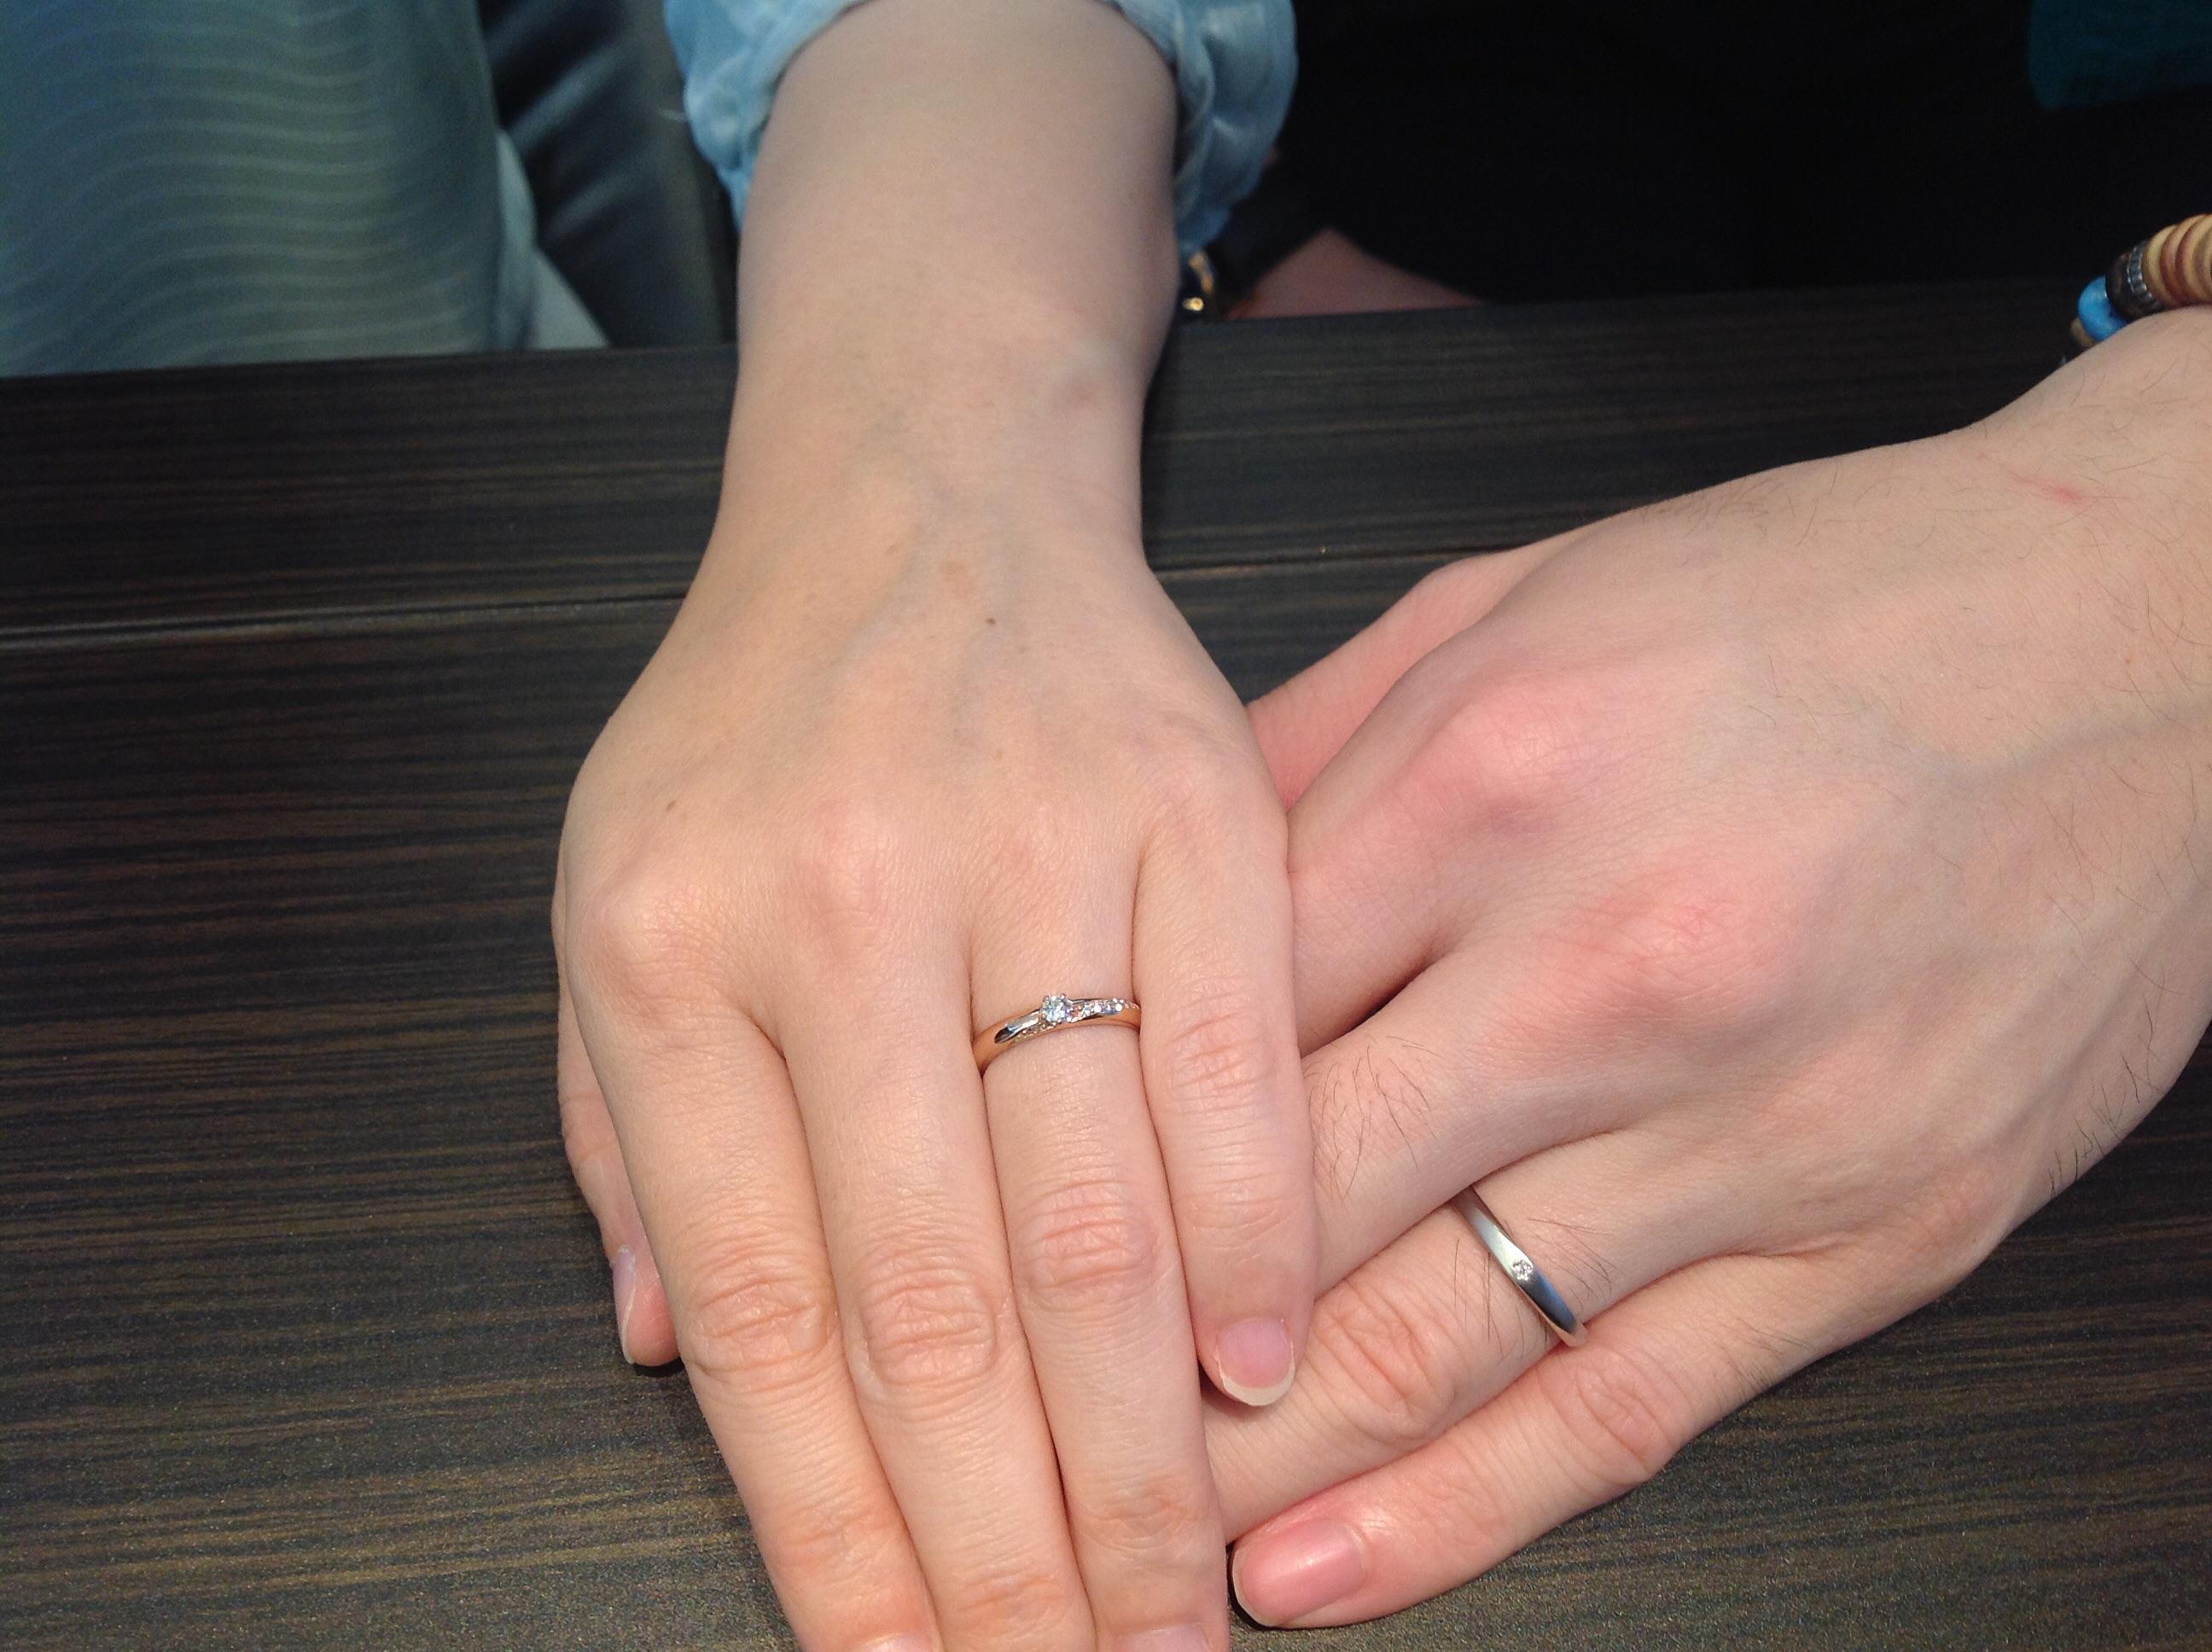 Wish upon a star(ウィッシュアポンアスター)の結婚指輪(マリッジリング)をお作り頂きました